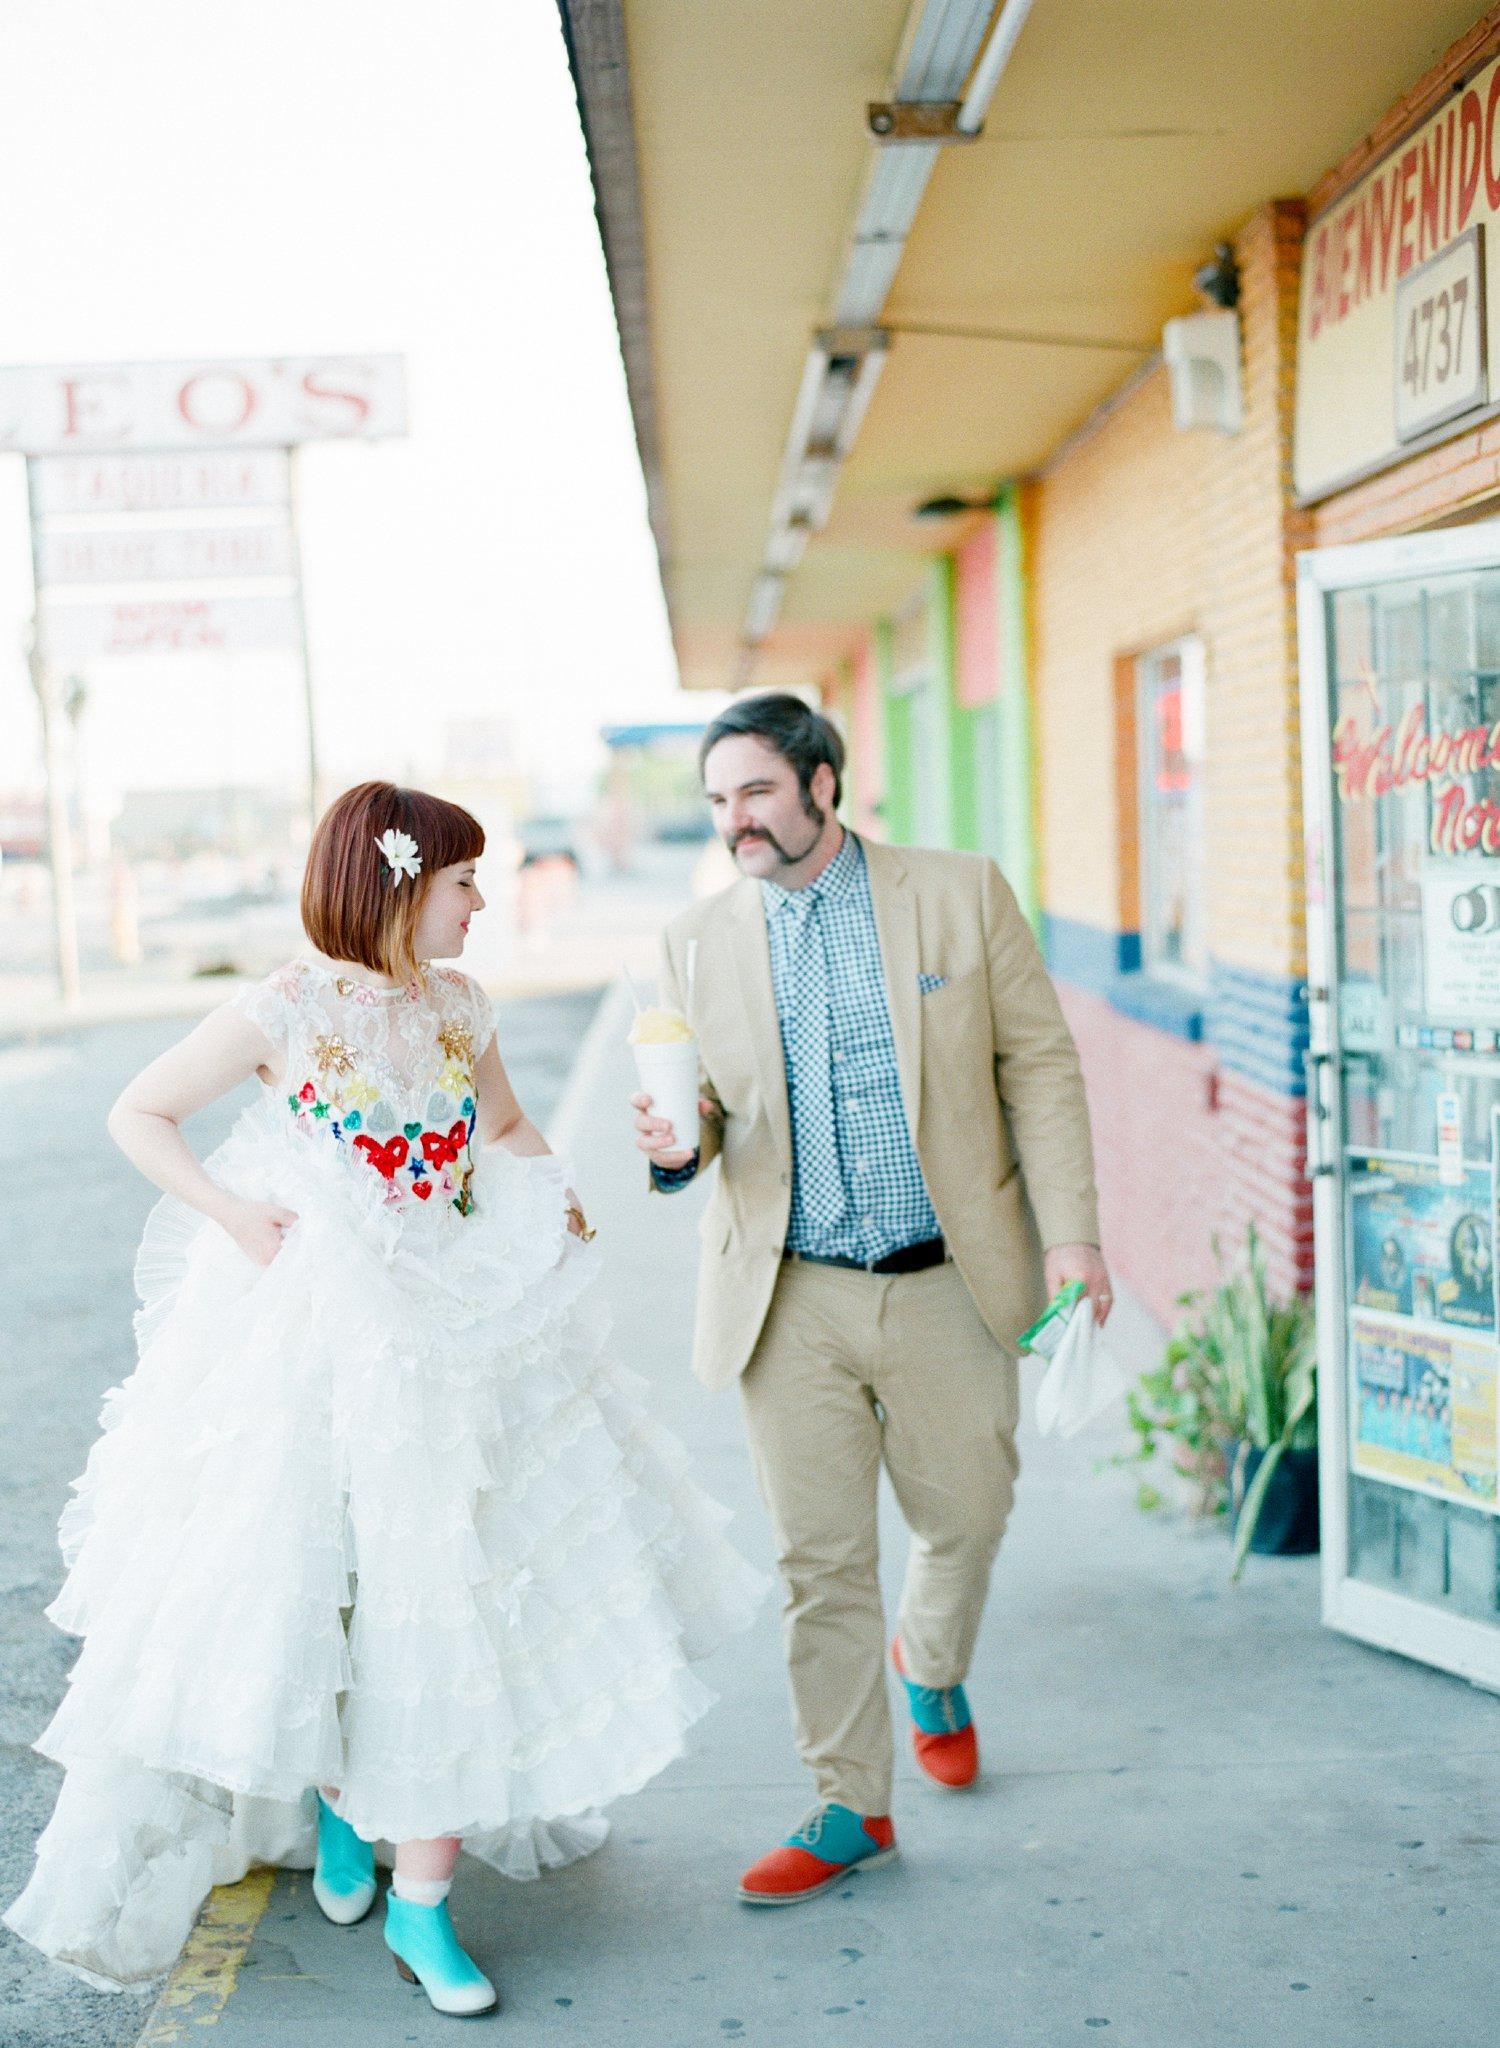 eclectic texan wedding the connoisseur of cute wedding texas wedding photographer shannon griffin photography_0013.jpg